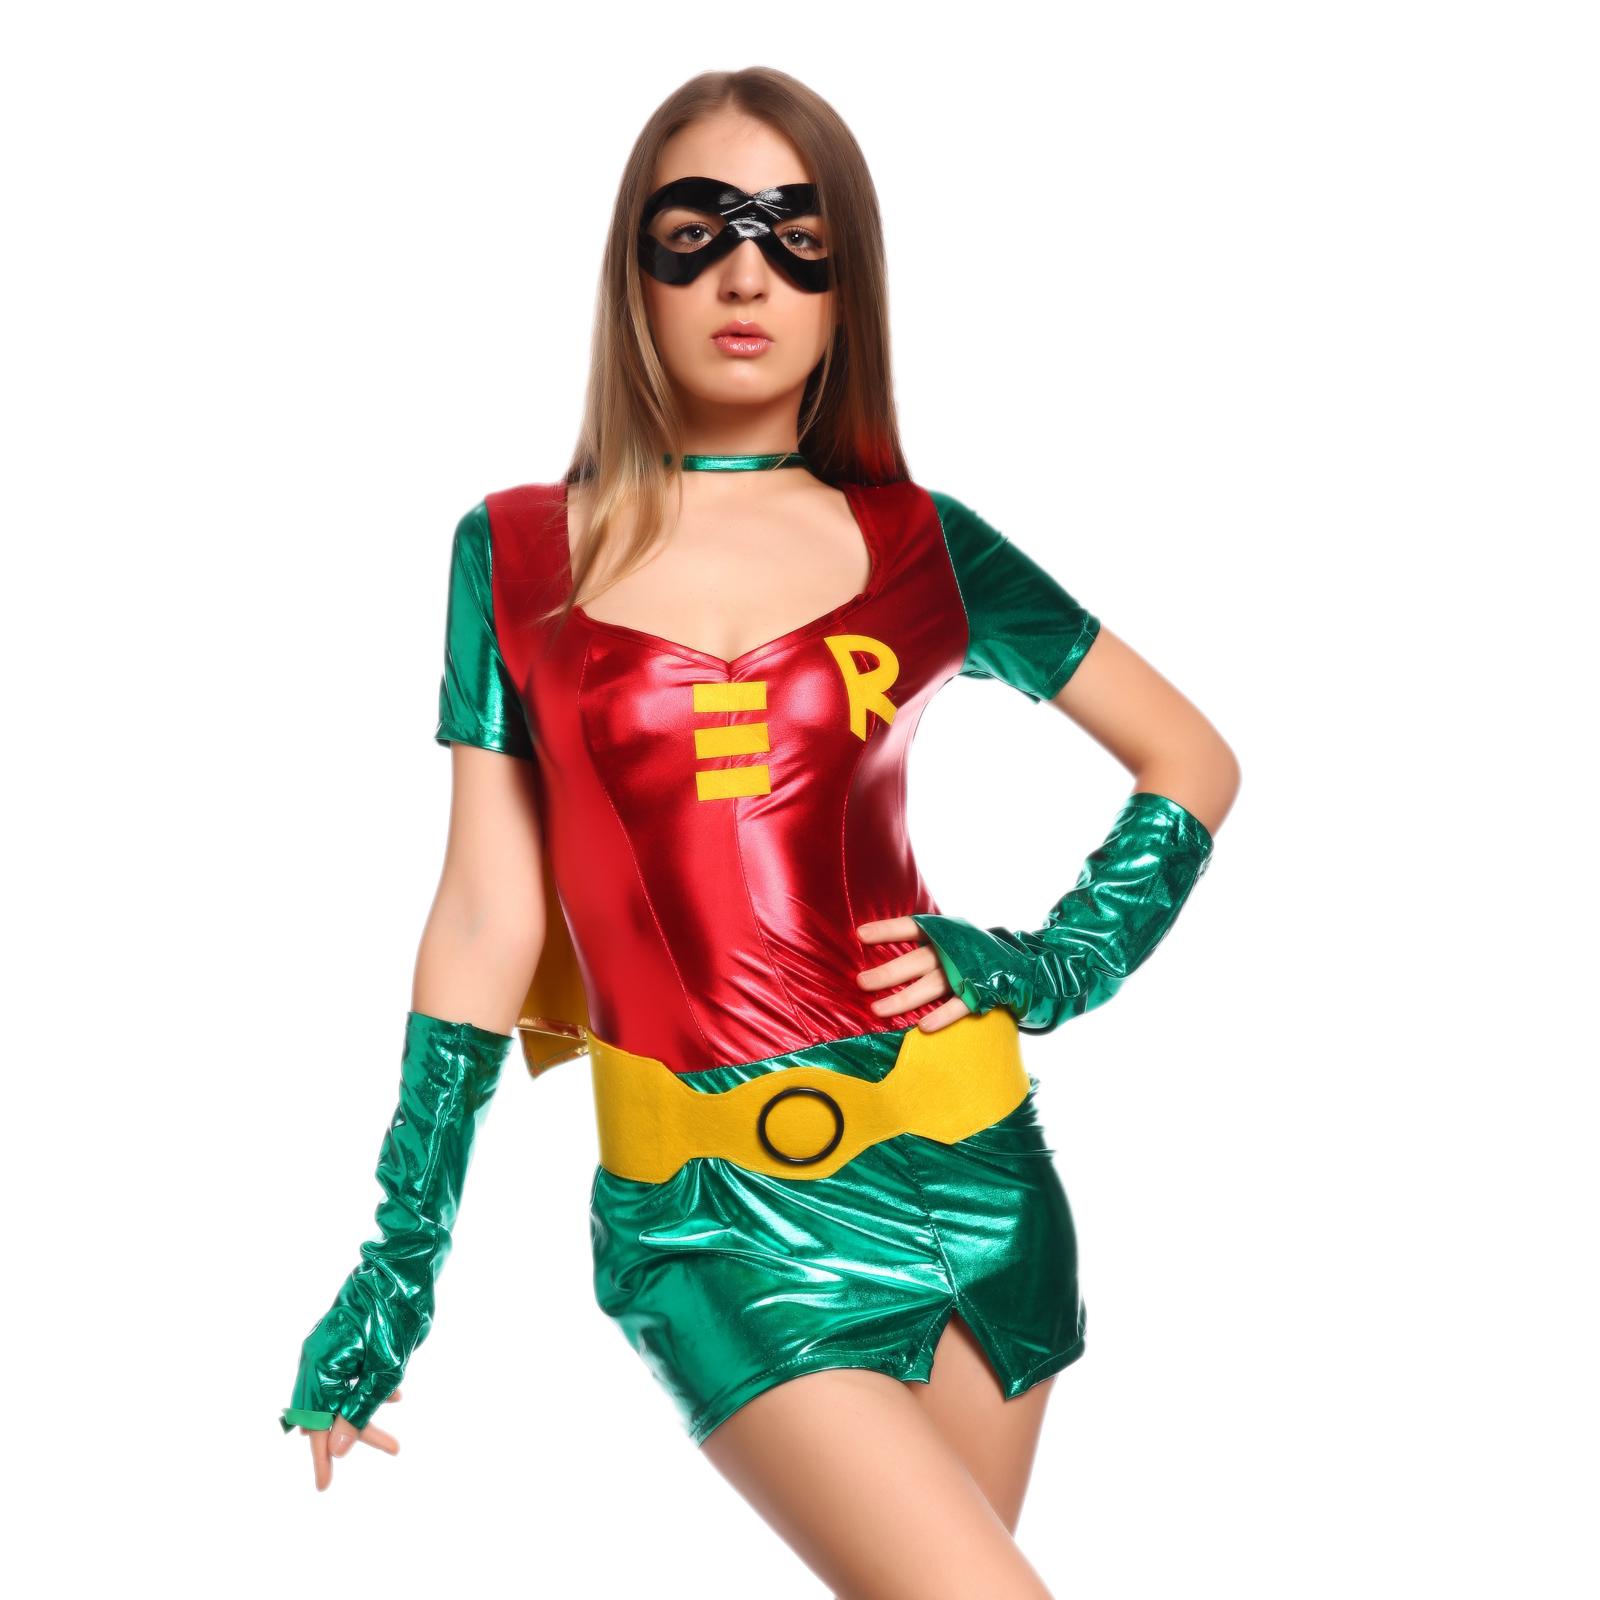 bf601a68c7e 6 Heroine Superhero Supergirl Wonder Woman Bat Girl Fancy Dress ...